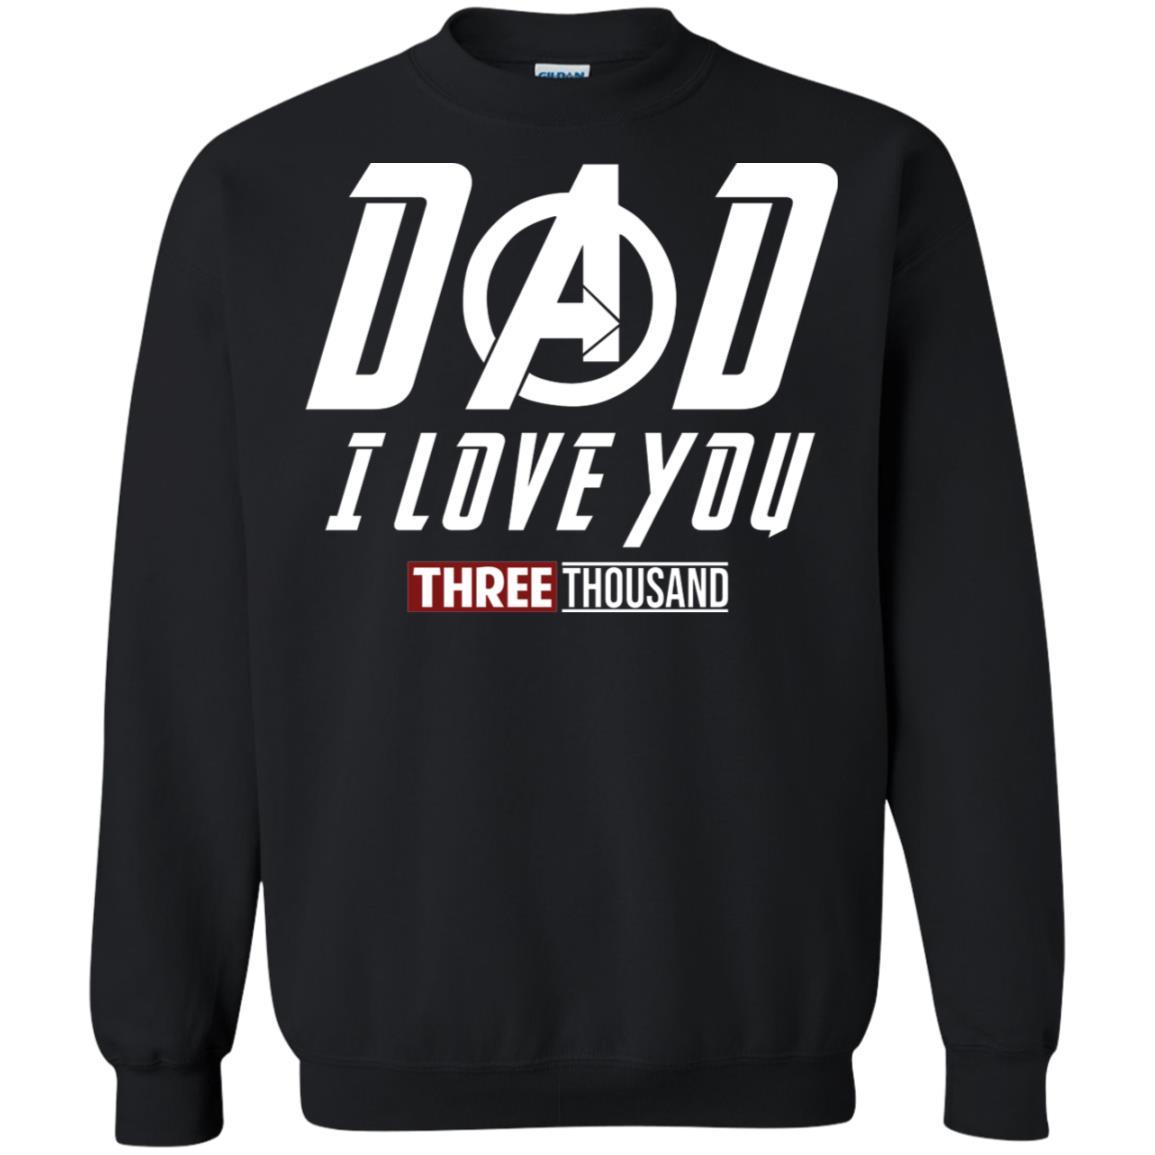 67962db0 Iron Man Dad I love you three thousand t shirt, tank top, hoodie ...